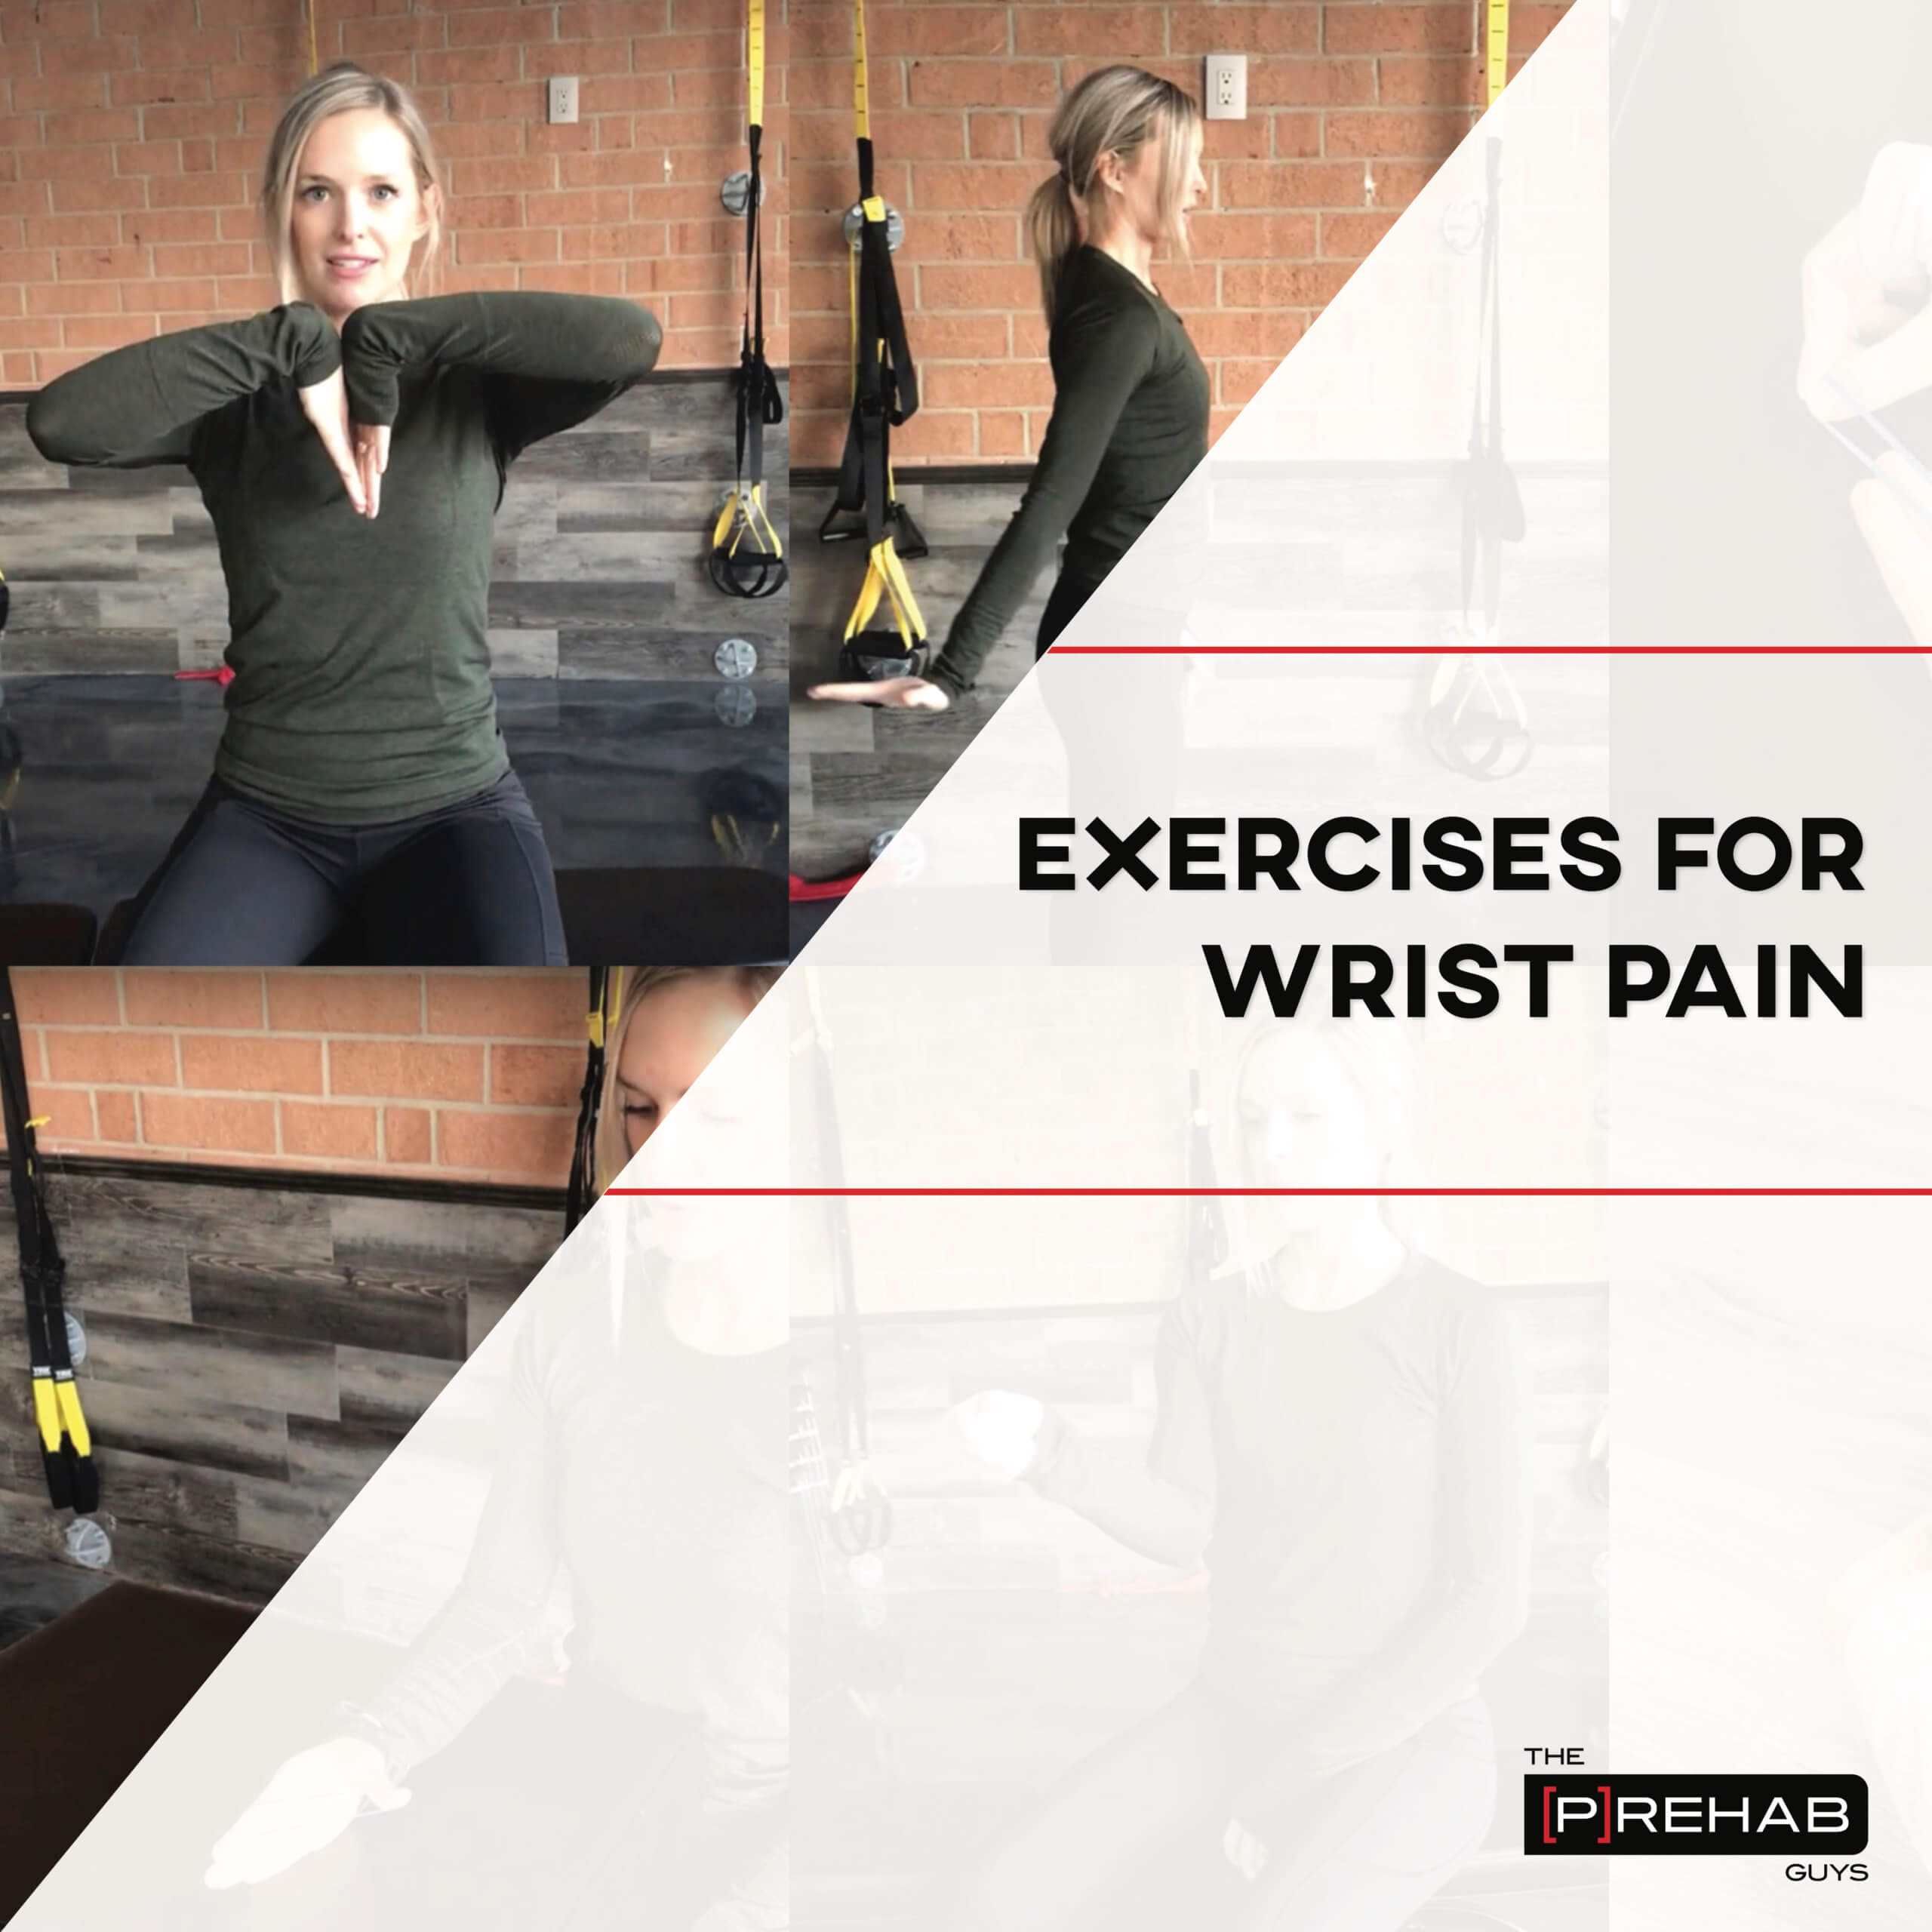 exercises for wrist pain the prehab guys